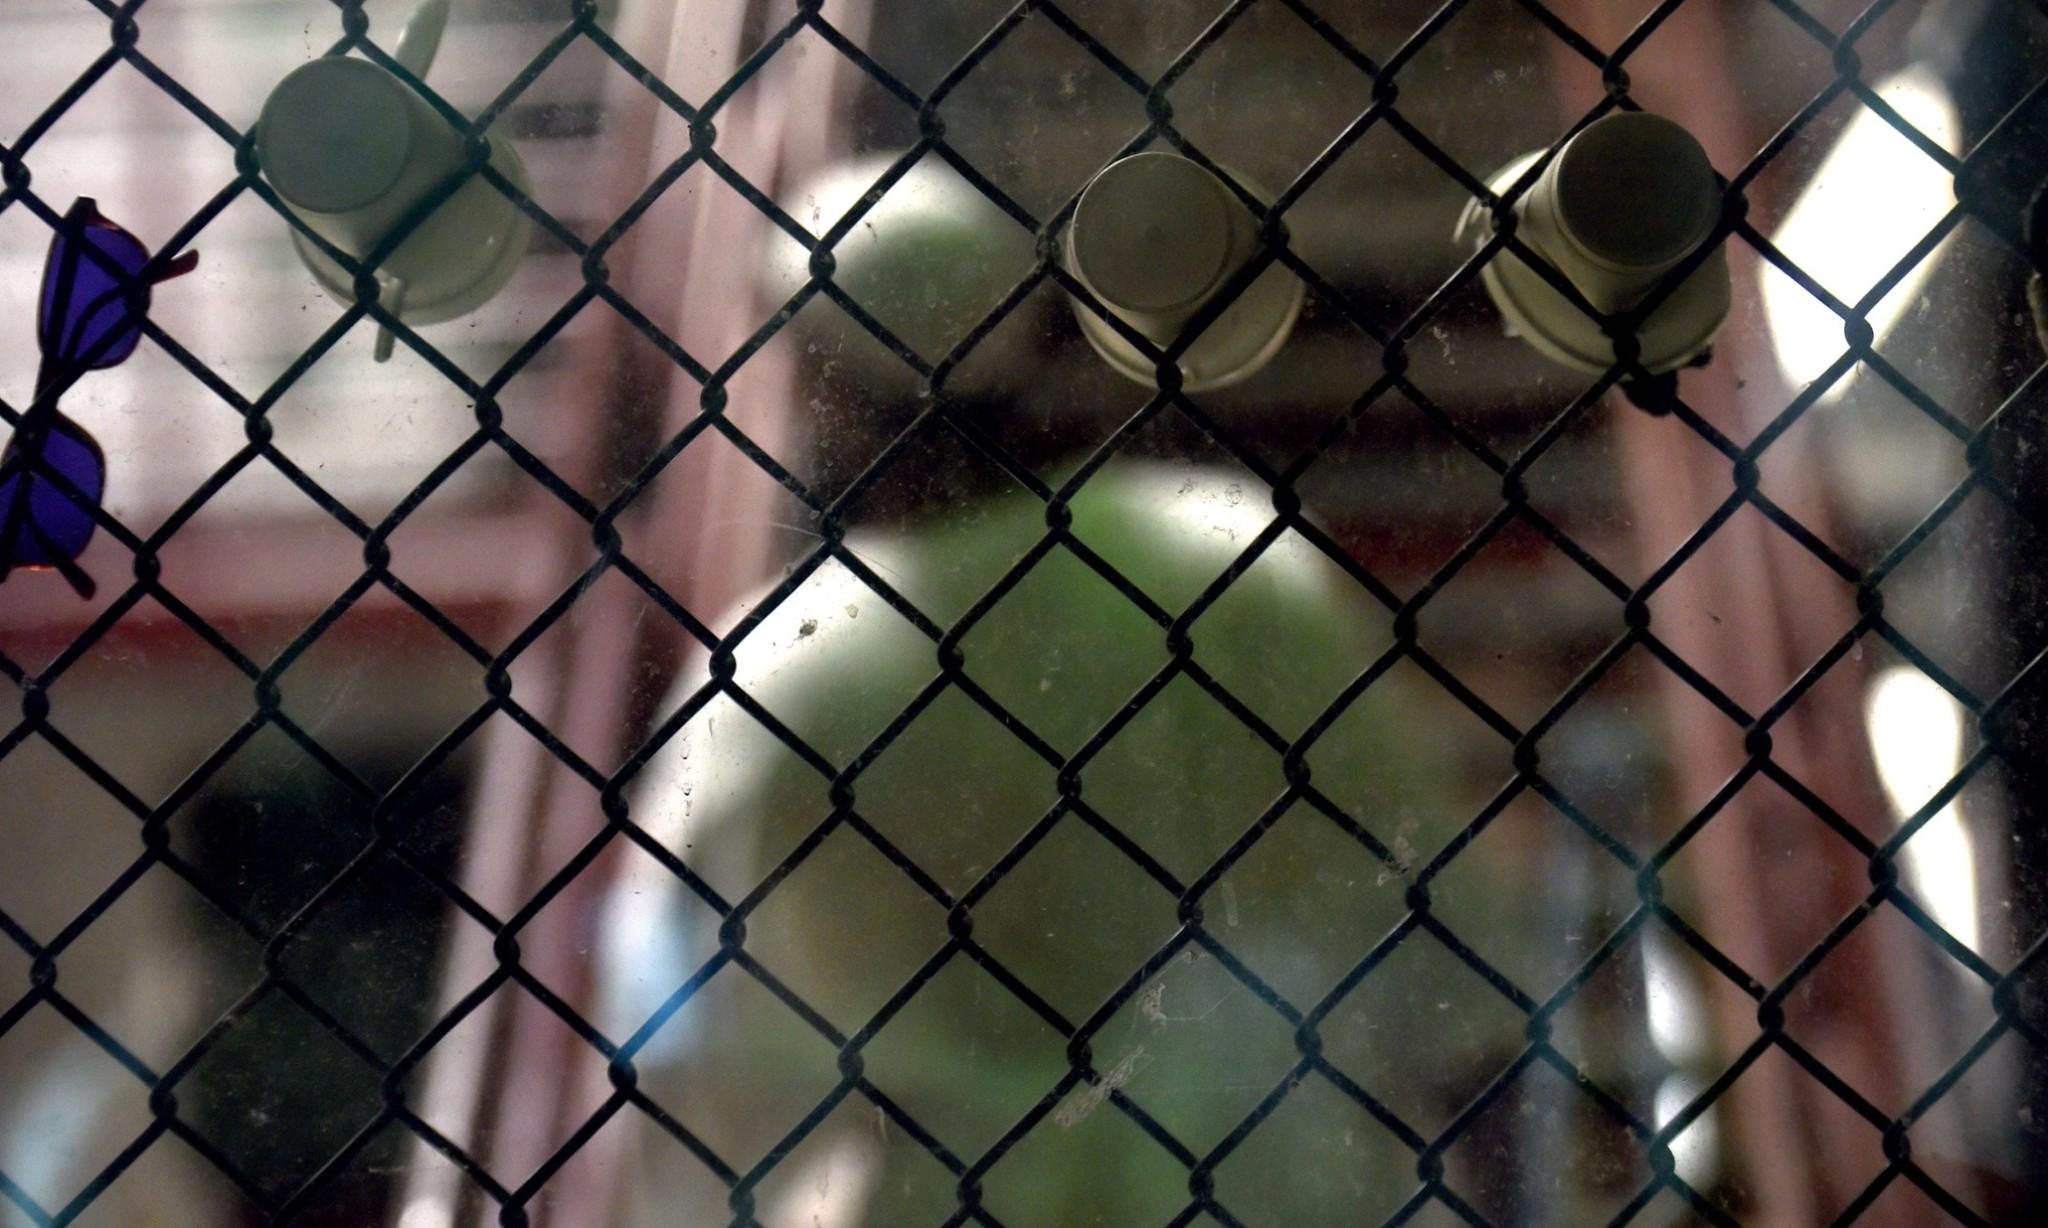 UN torture report condemns sleep deprivation among US detainees